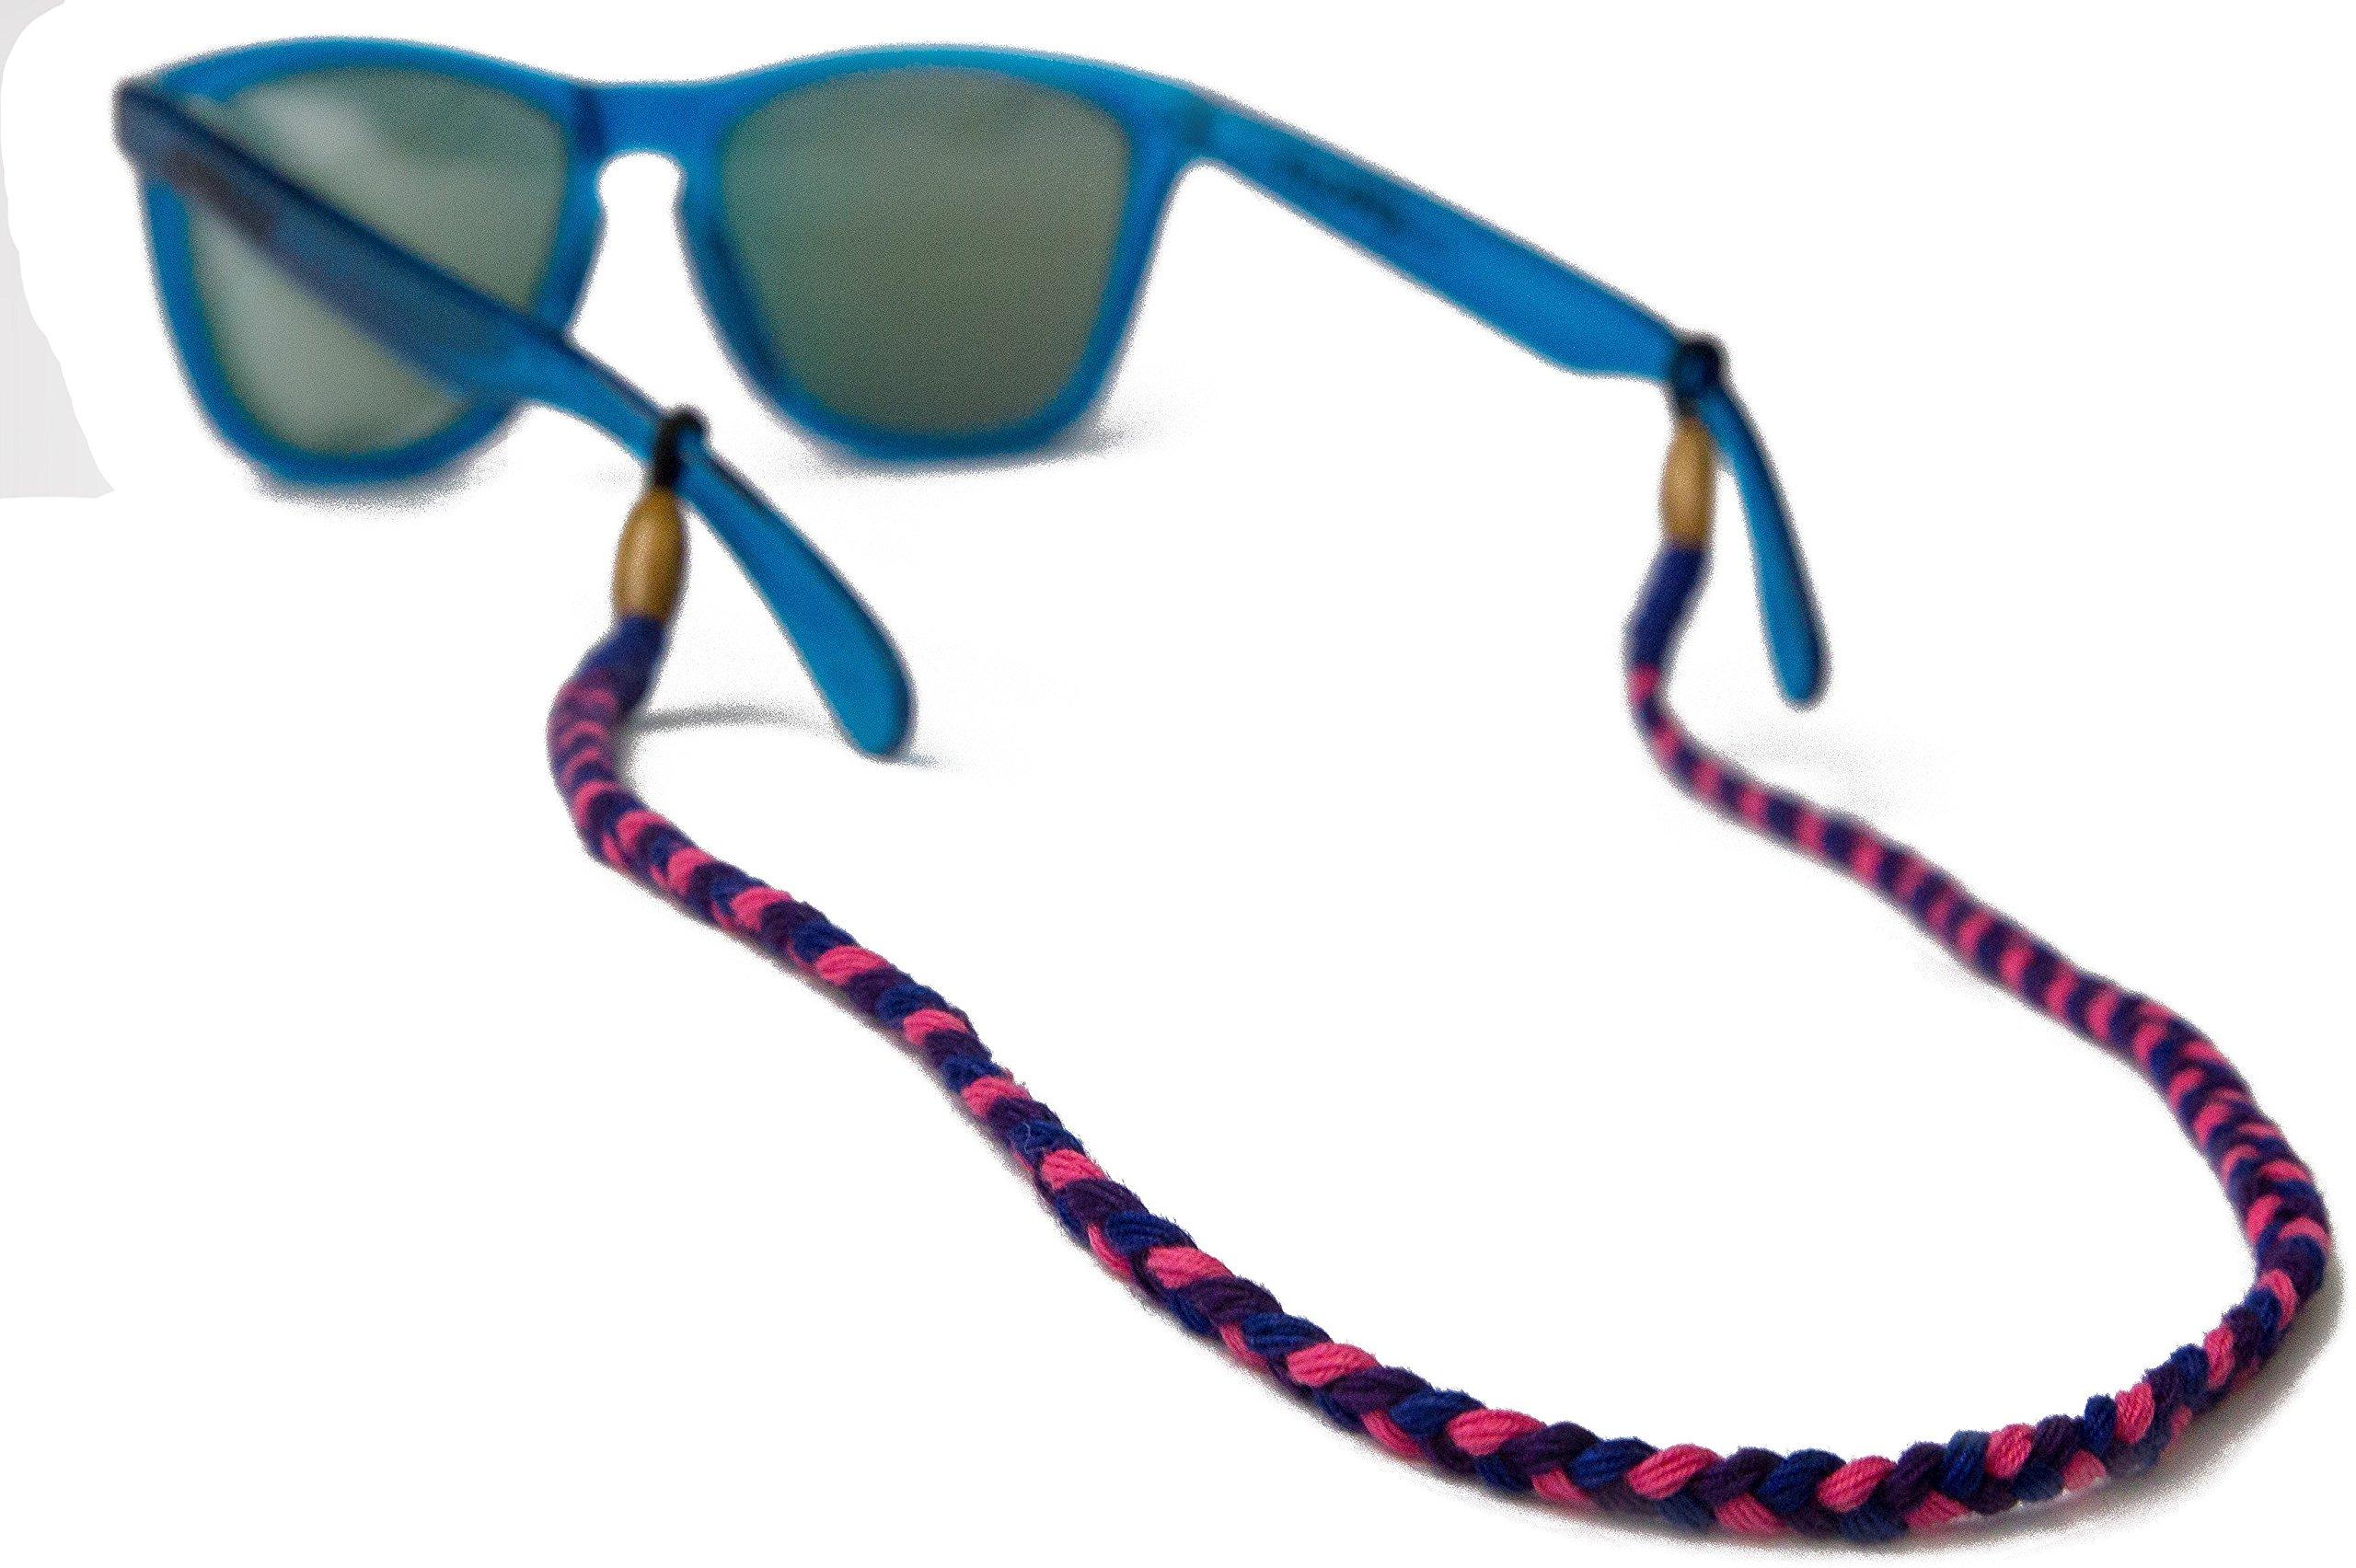 Adjustable Eyewear Retainer for Women– Handmade Sunglass Strap Holder - Universal Fit - by Mayami by Mayami